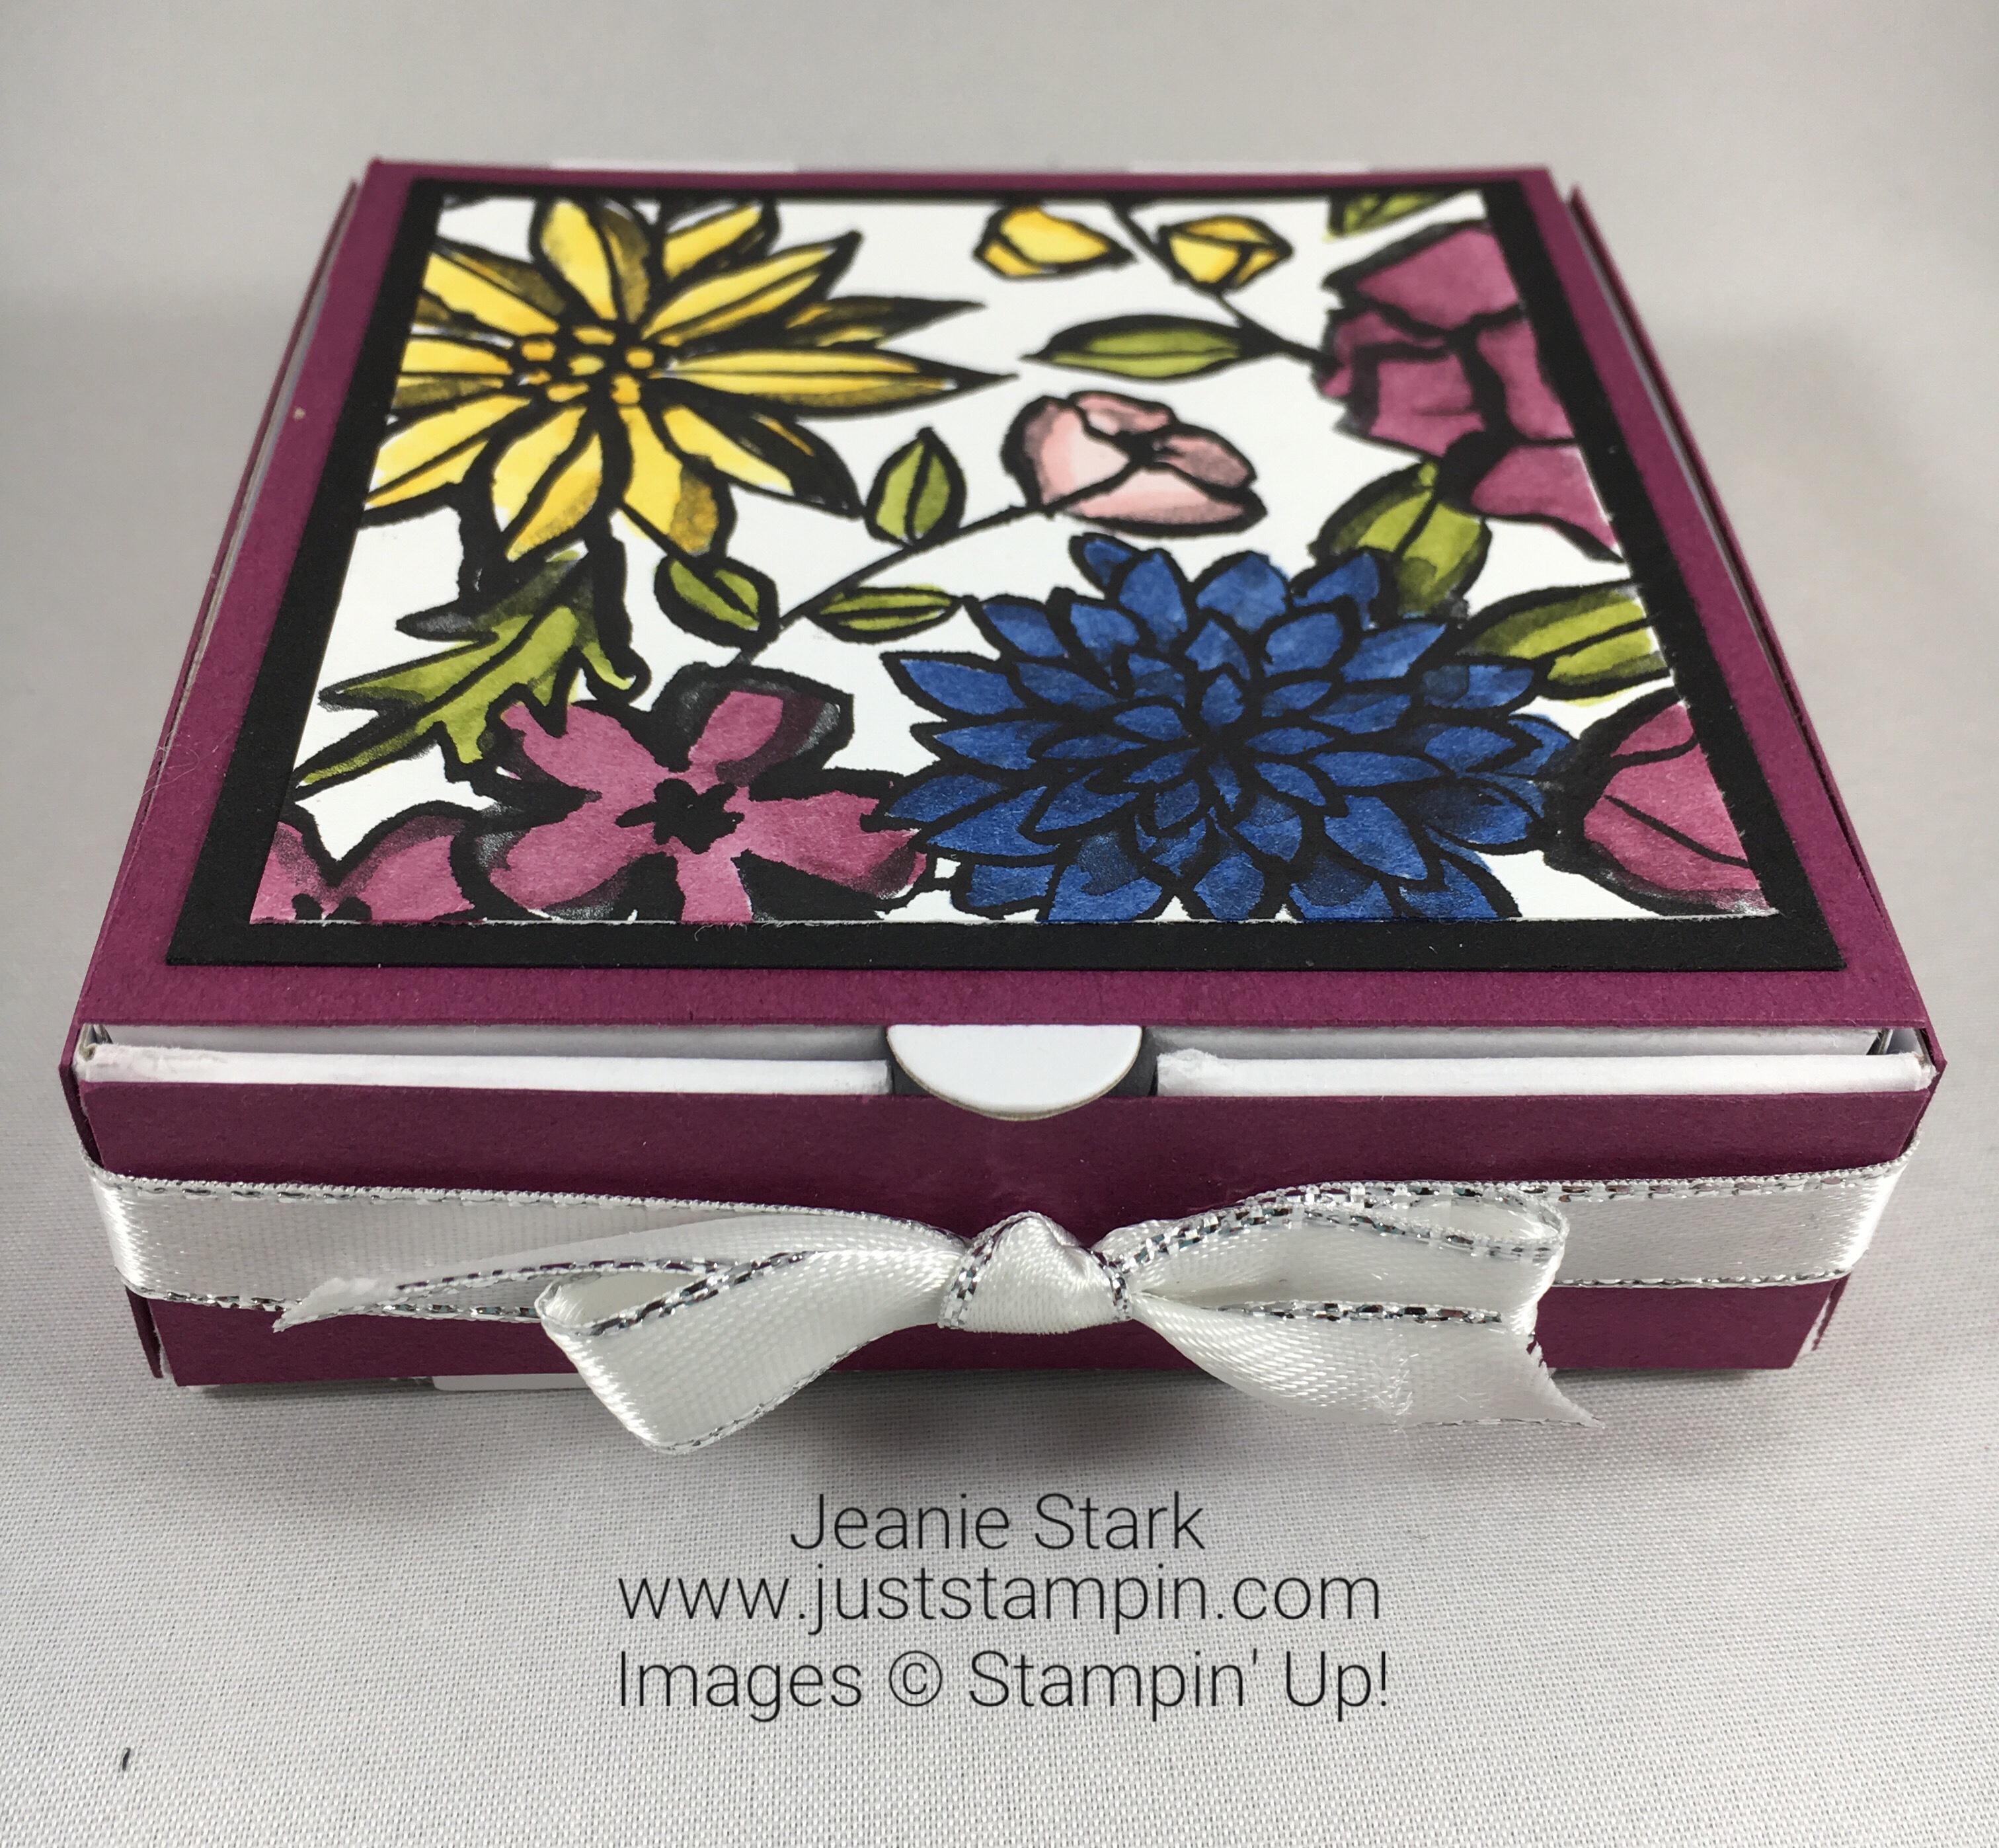 Stampin Up Pizza Box idea - Jeanie Stark StampinUp